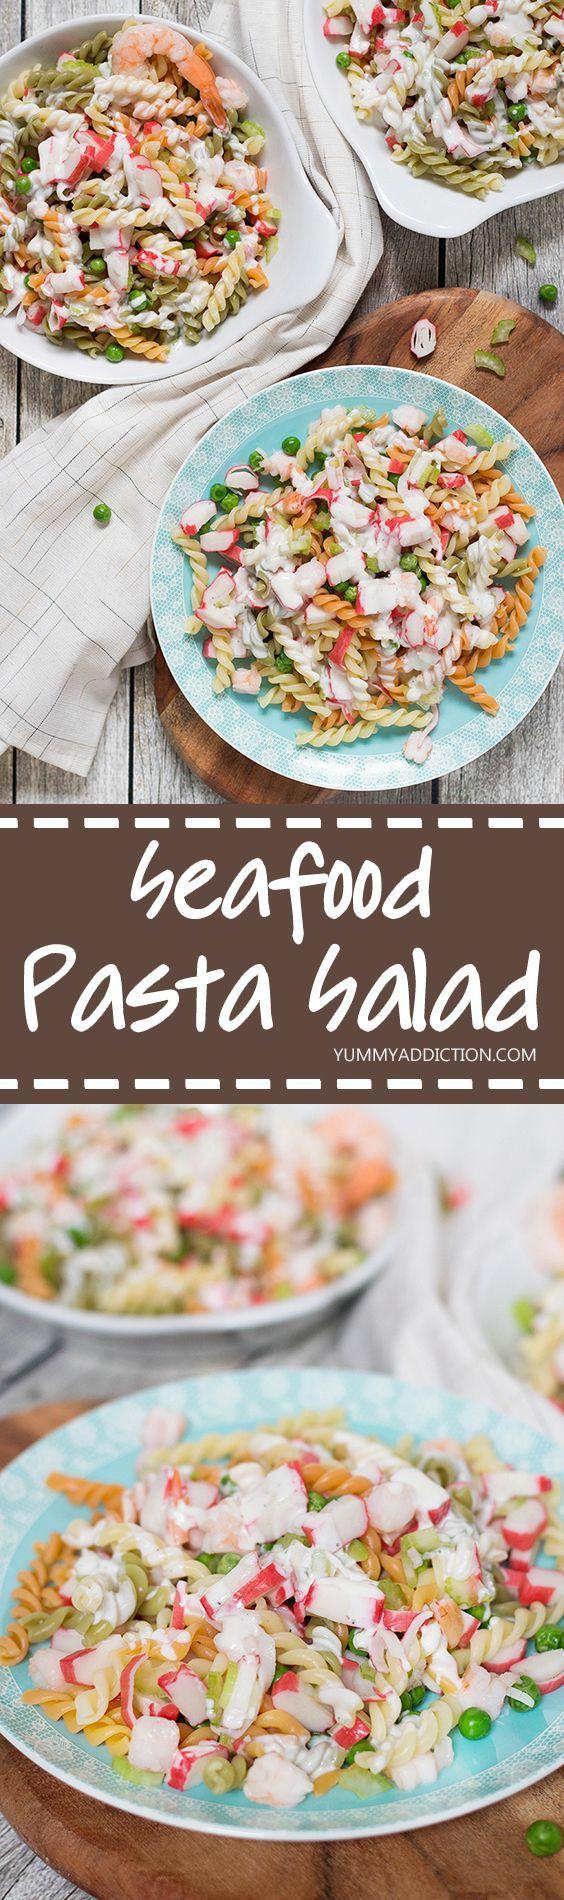 17 Best ideas about Seafood Pasta Salads on Pinterest ...